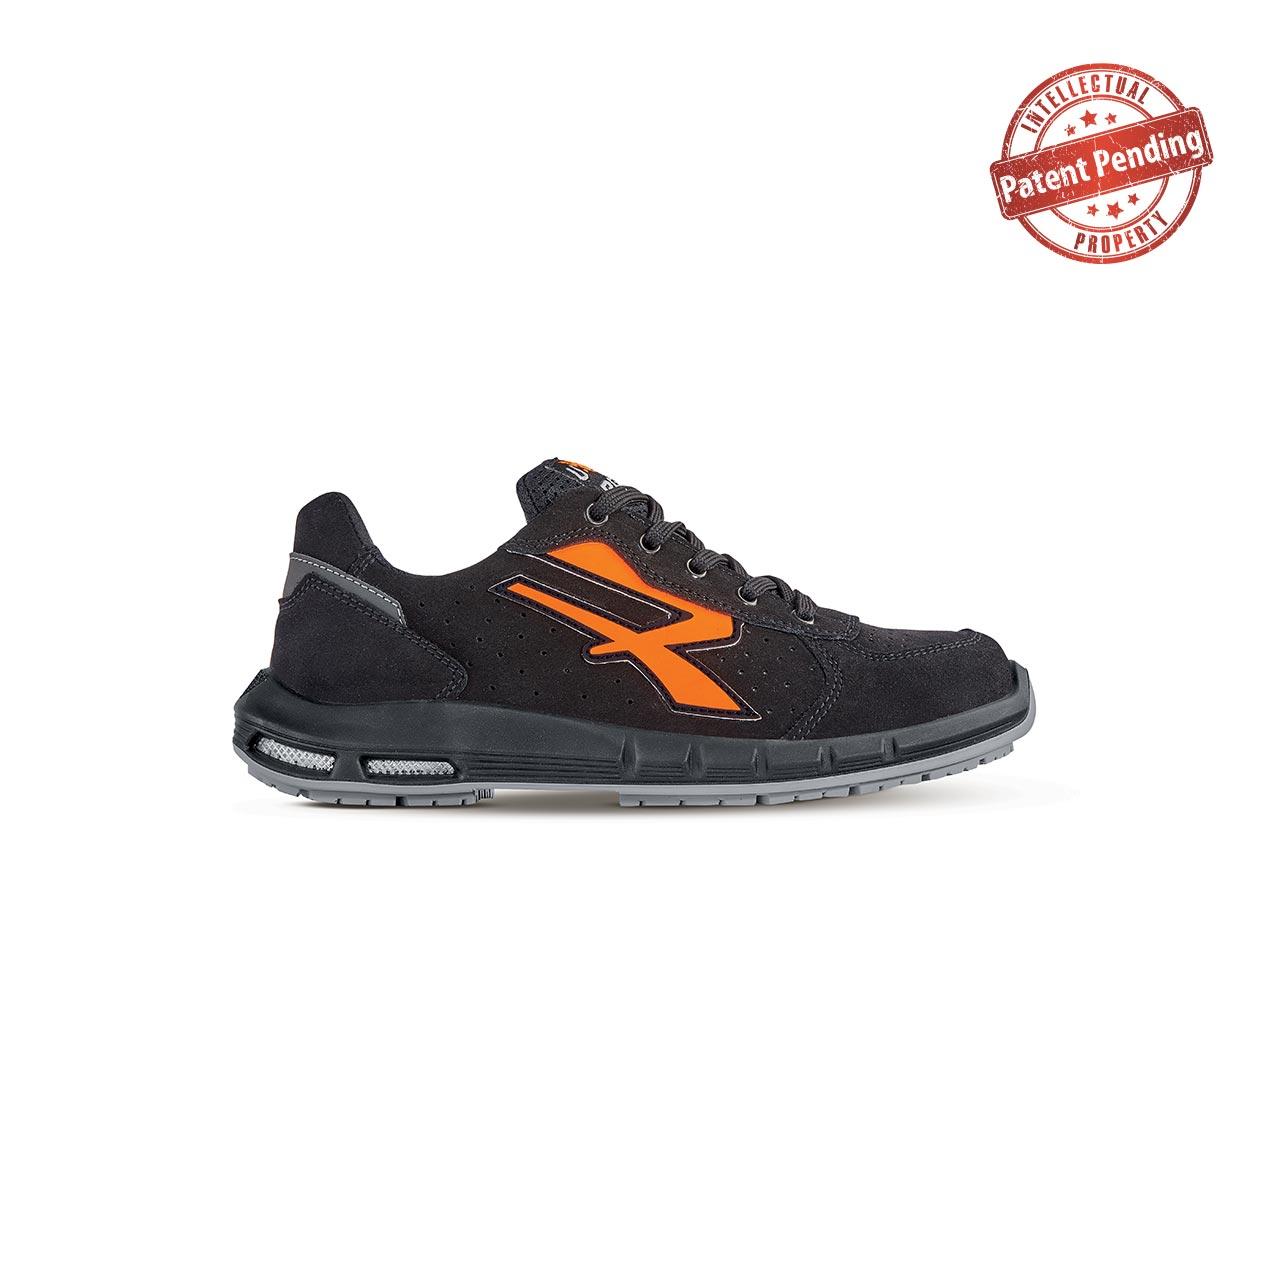 scarpa antinfortunistica upower modello orion plus linea redup plus vista laterale